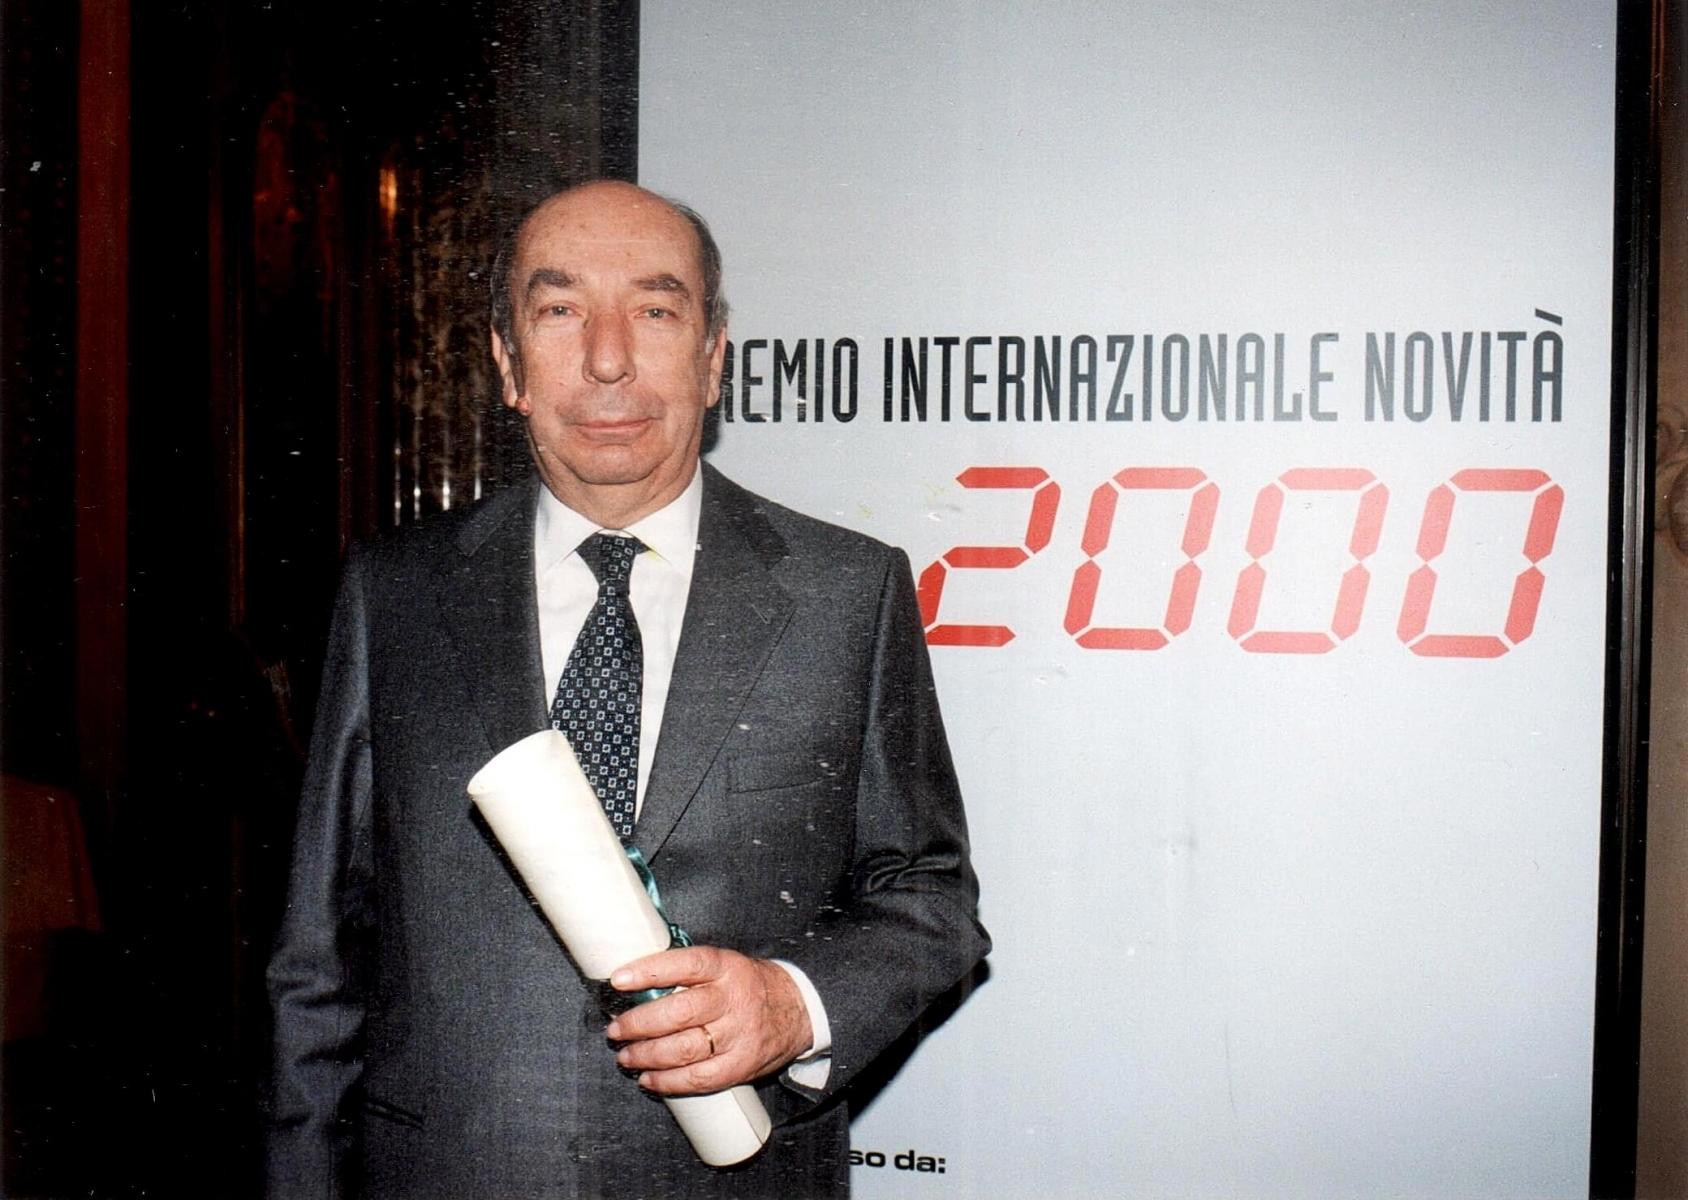 2 Oleodinamica Geco - Premio-novità-2000